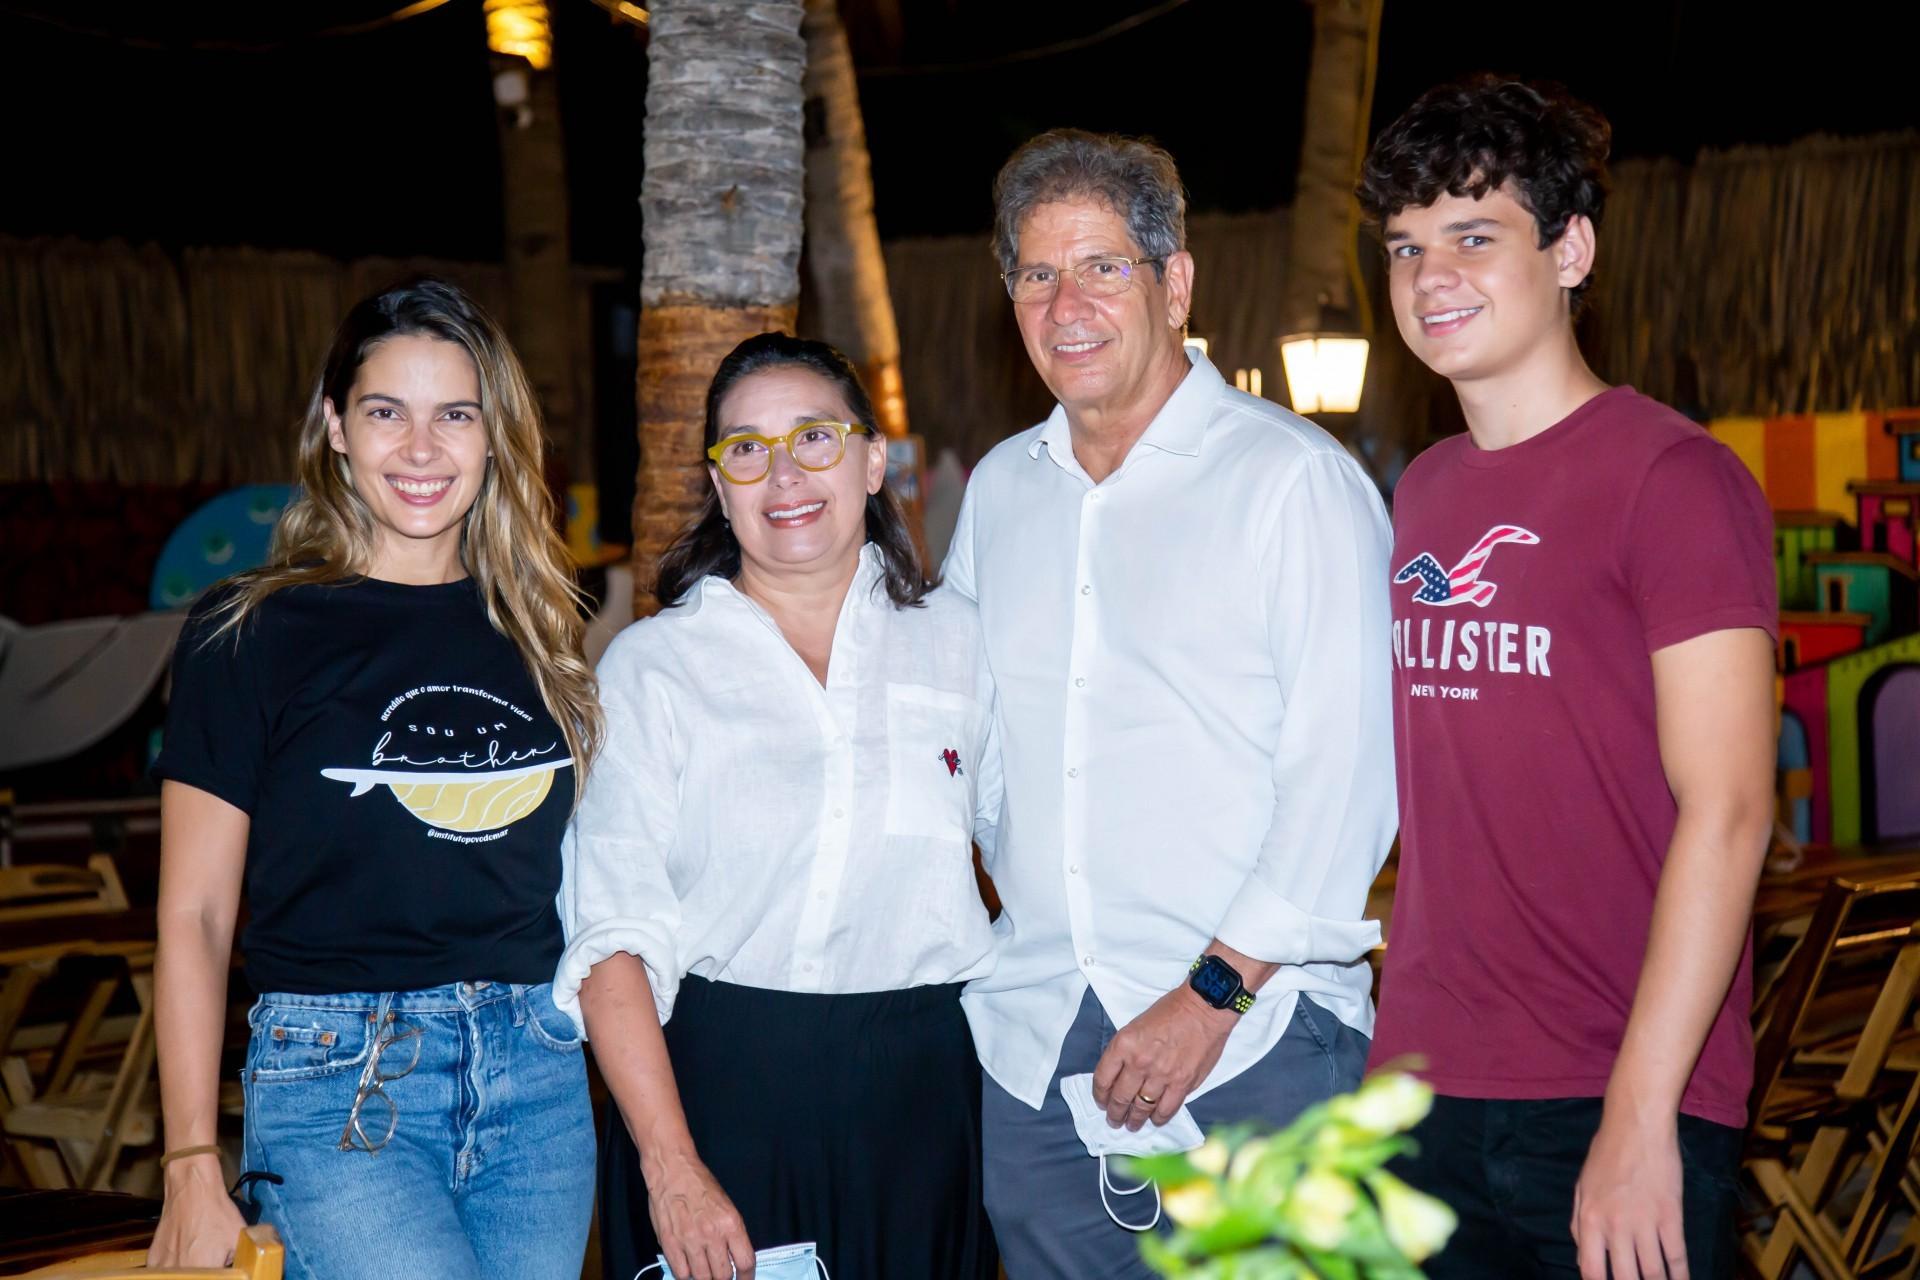 (Foto: Israel_Rodrigues/ Divulgação)Joana Ramalho, Isabela Ramalho, Severino Ramalho Neto e Vítor Ramalho